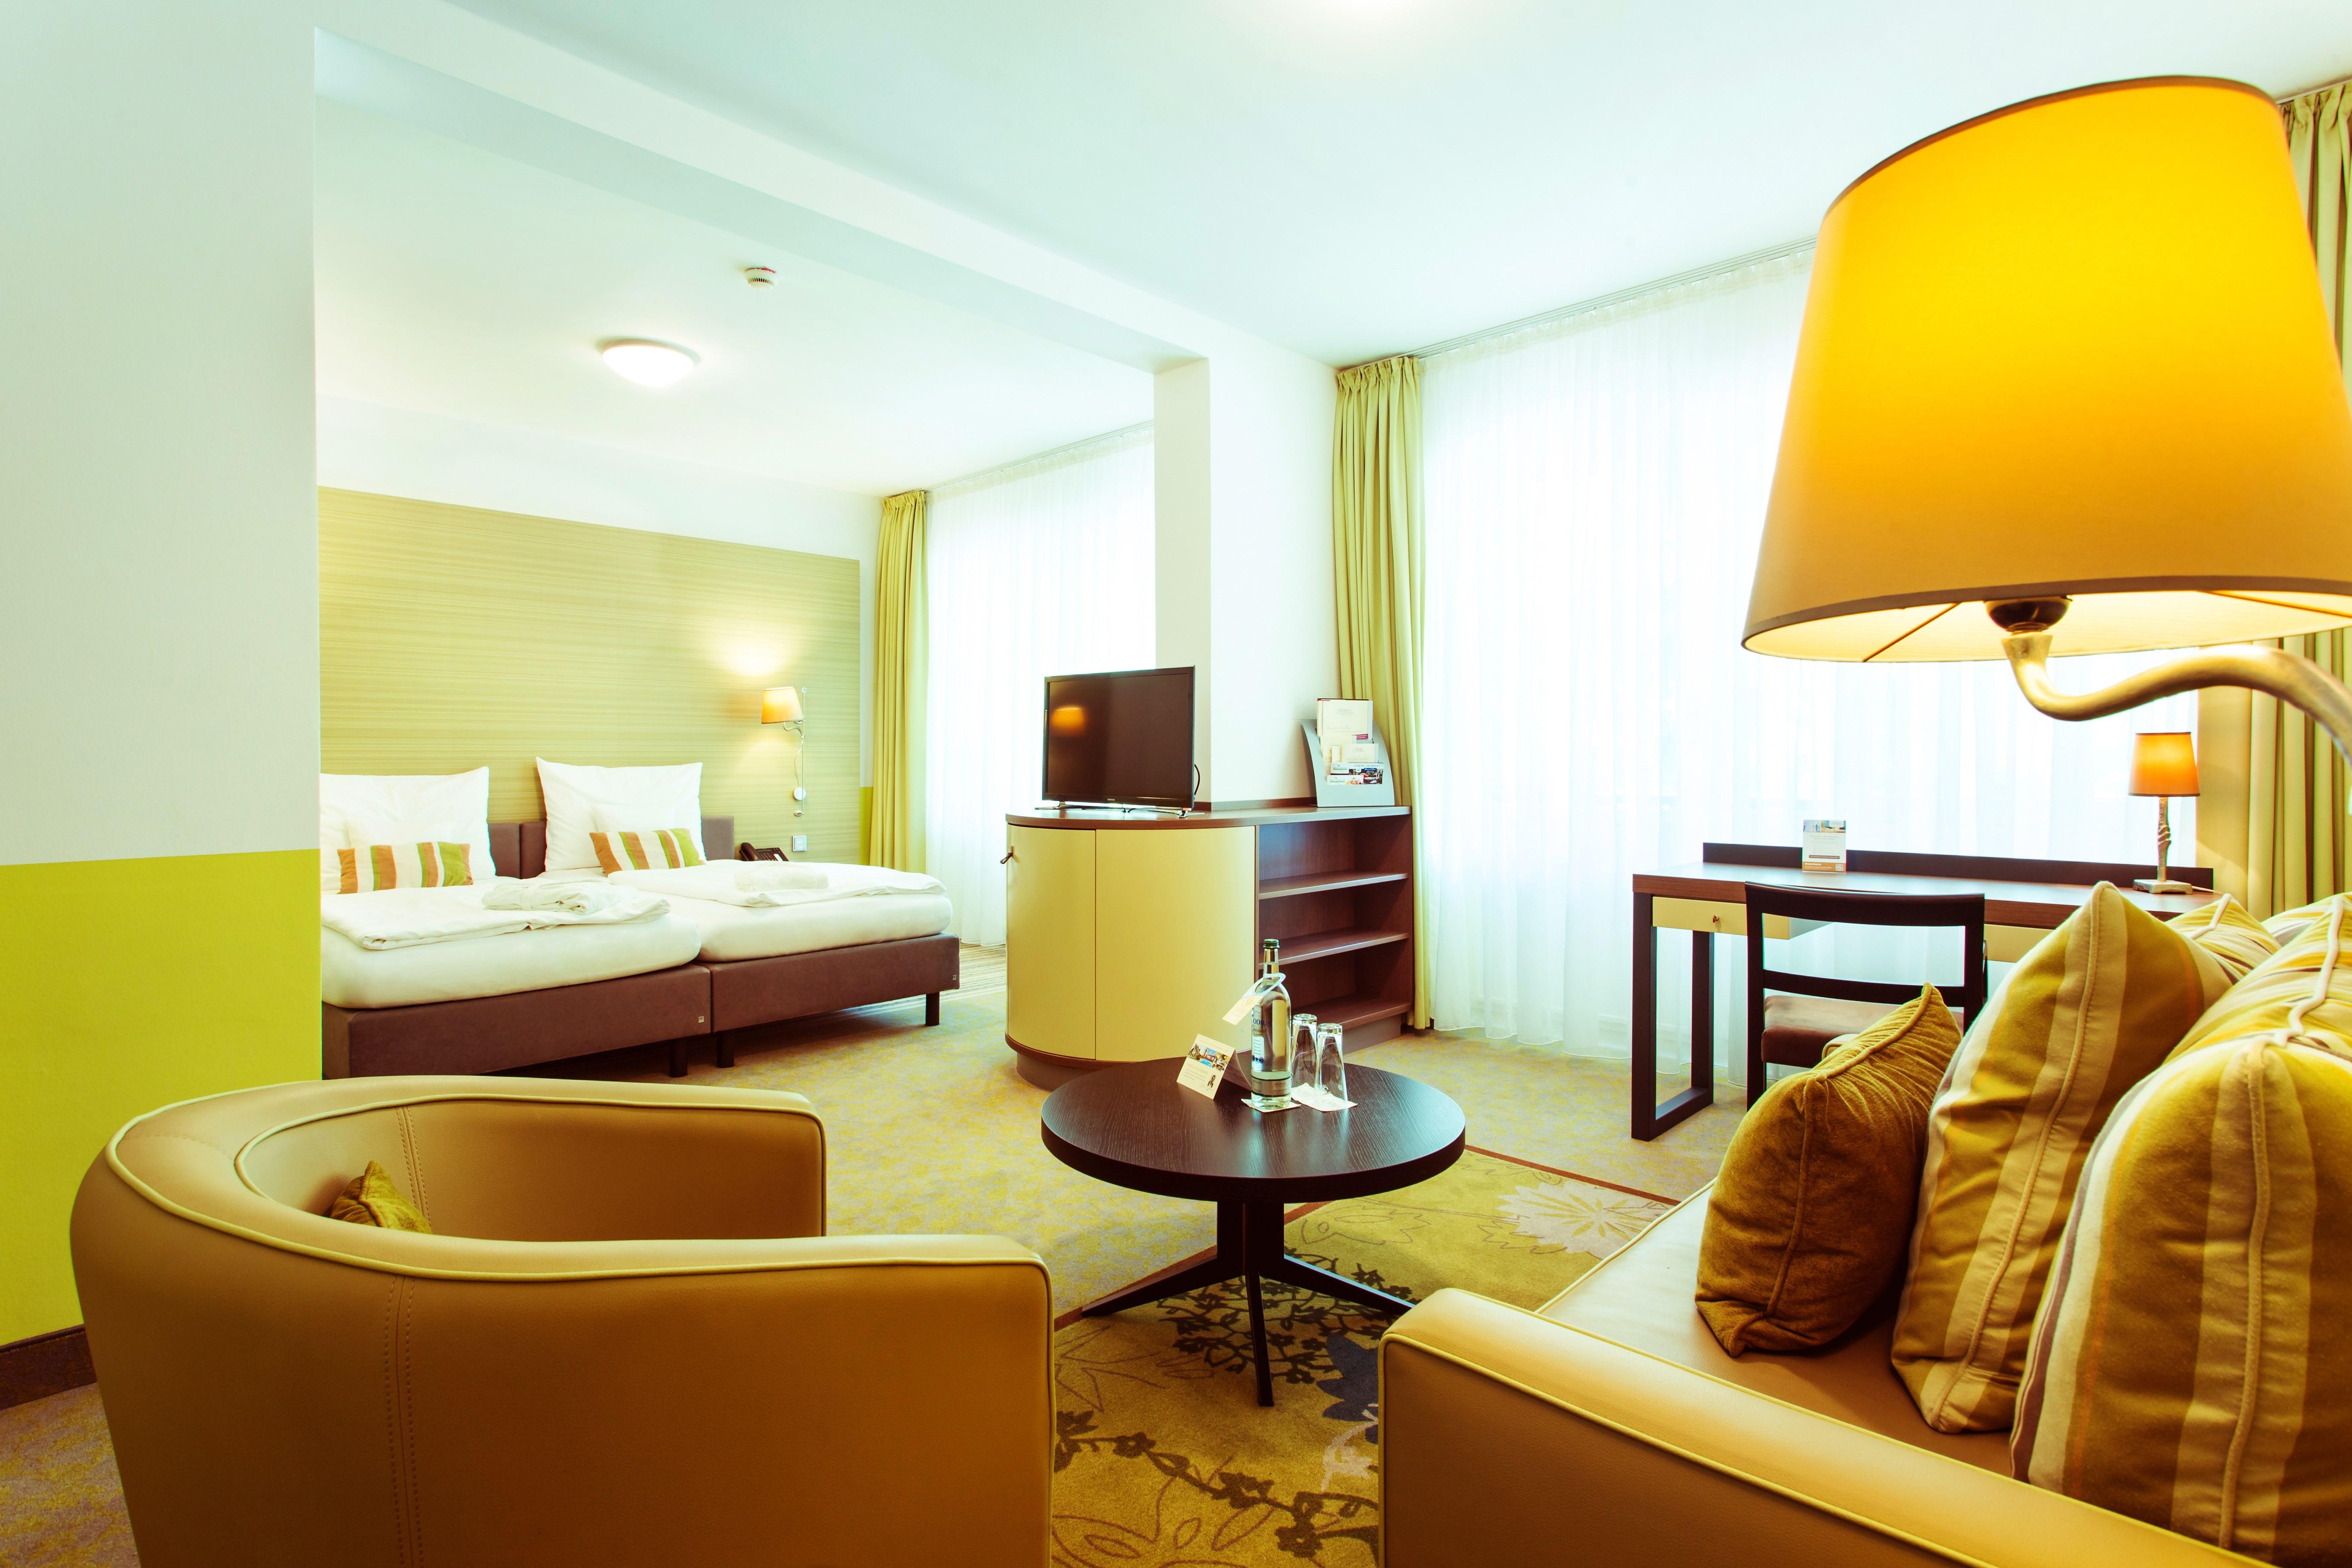 Göbel´s Vital Hotel Bad Sachsa - Komfort Doppelzimmer plus